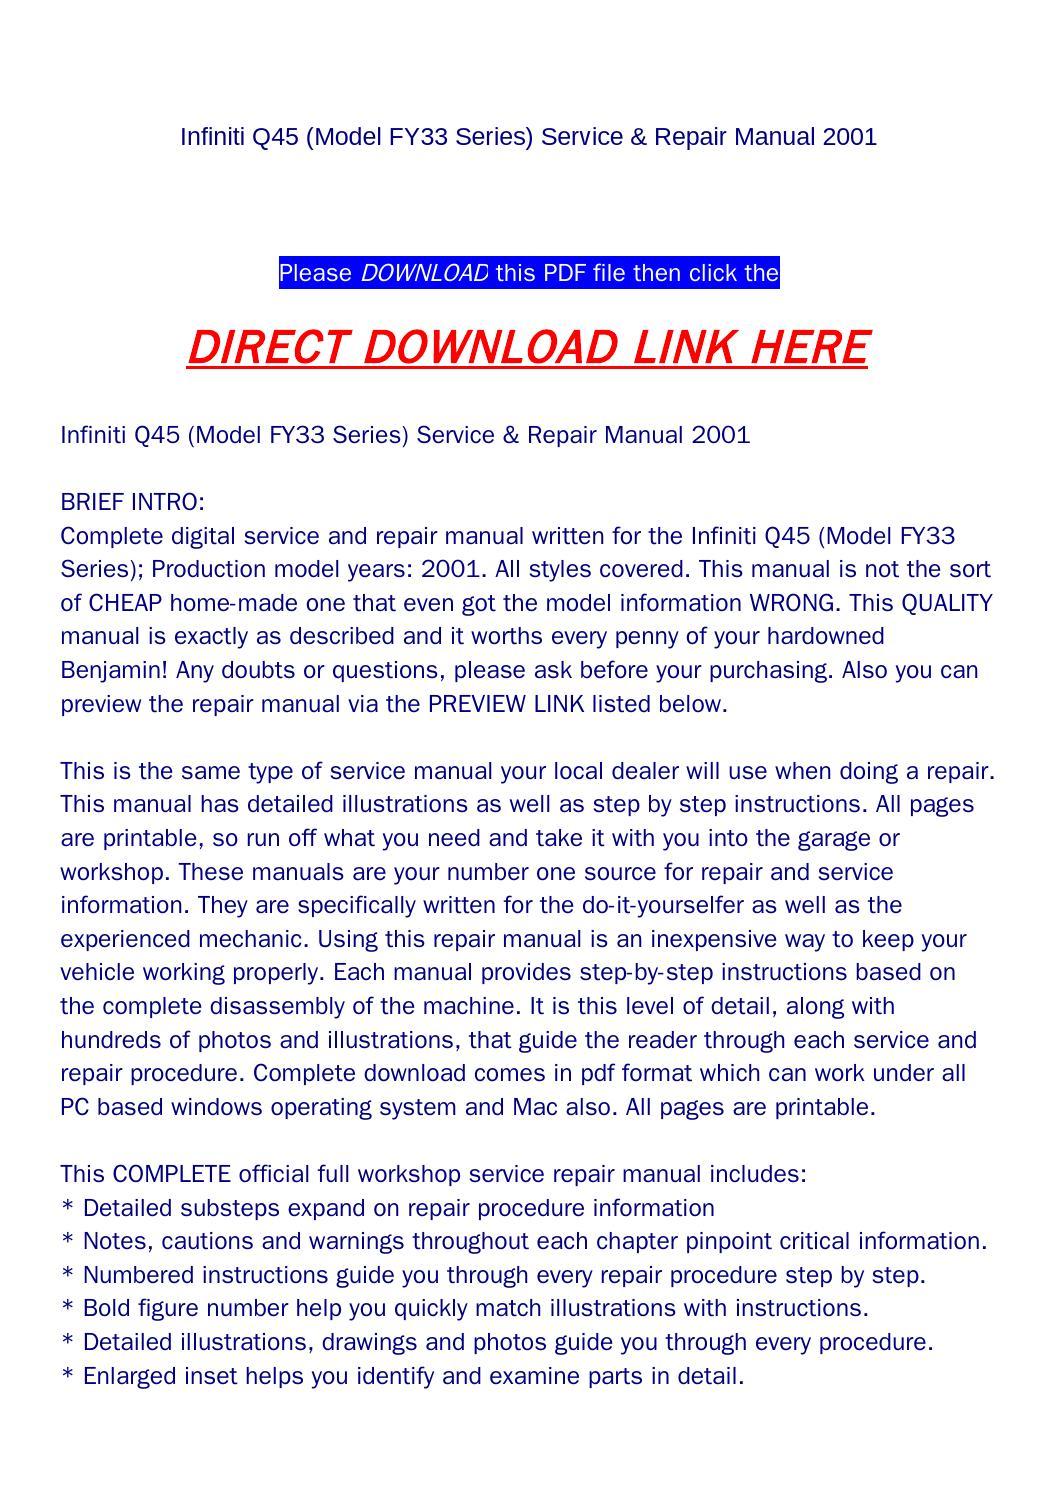 Infiniti q45 (model fy33 series) service & repair manual 2001 by goodmanami  - issuu